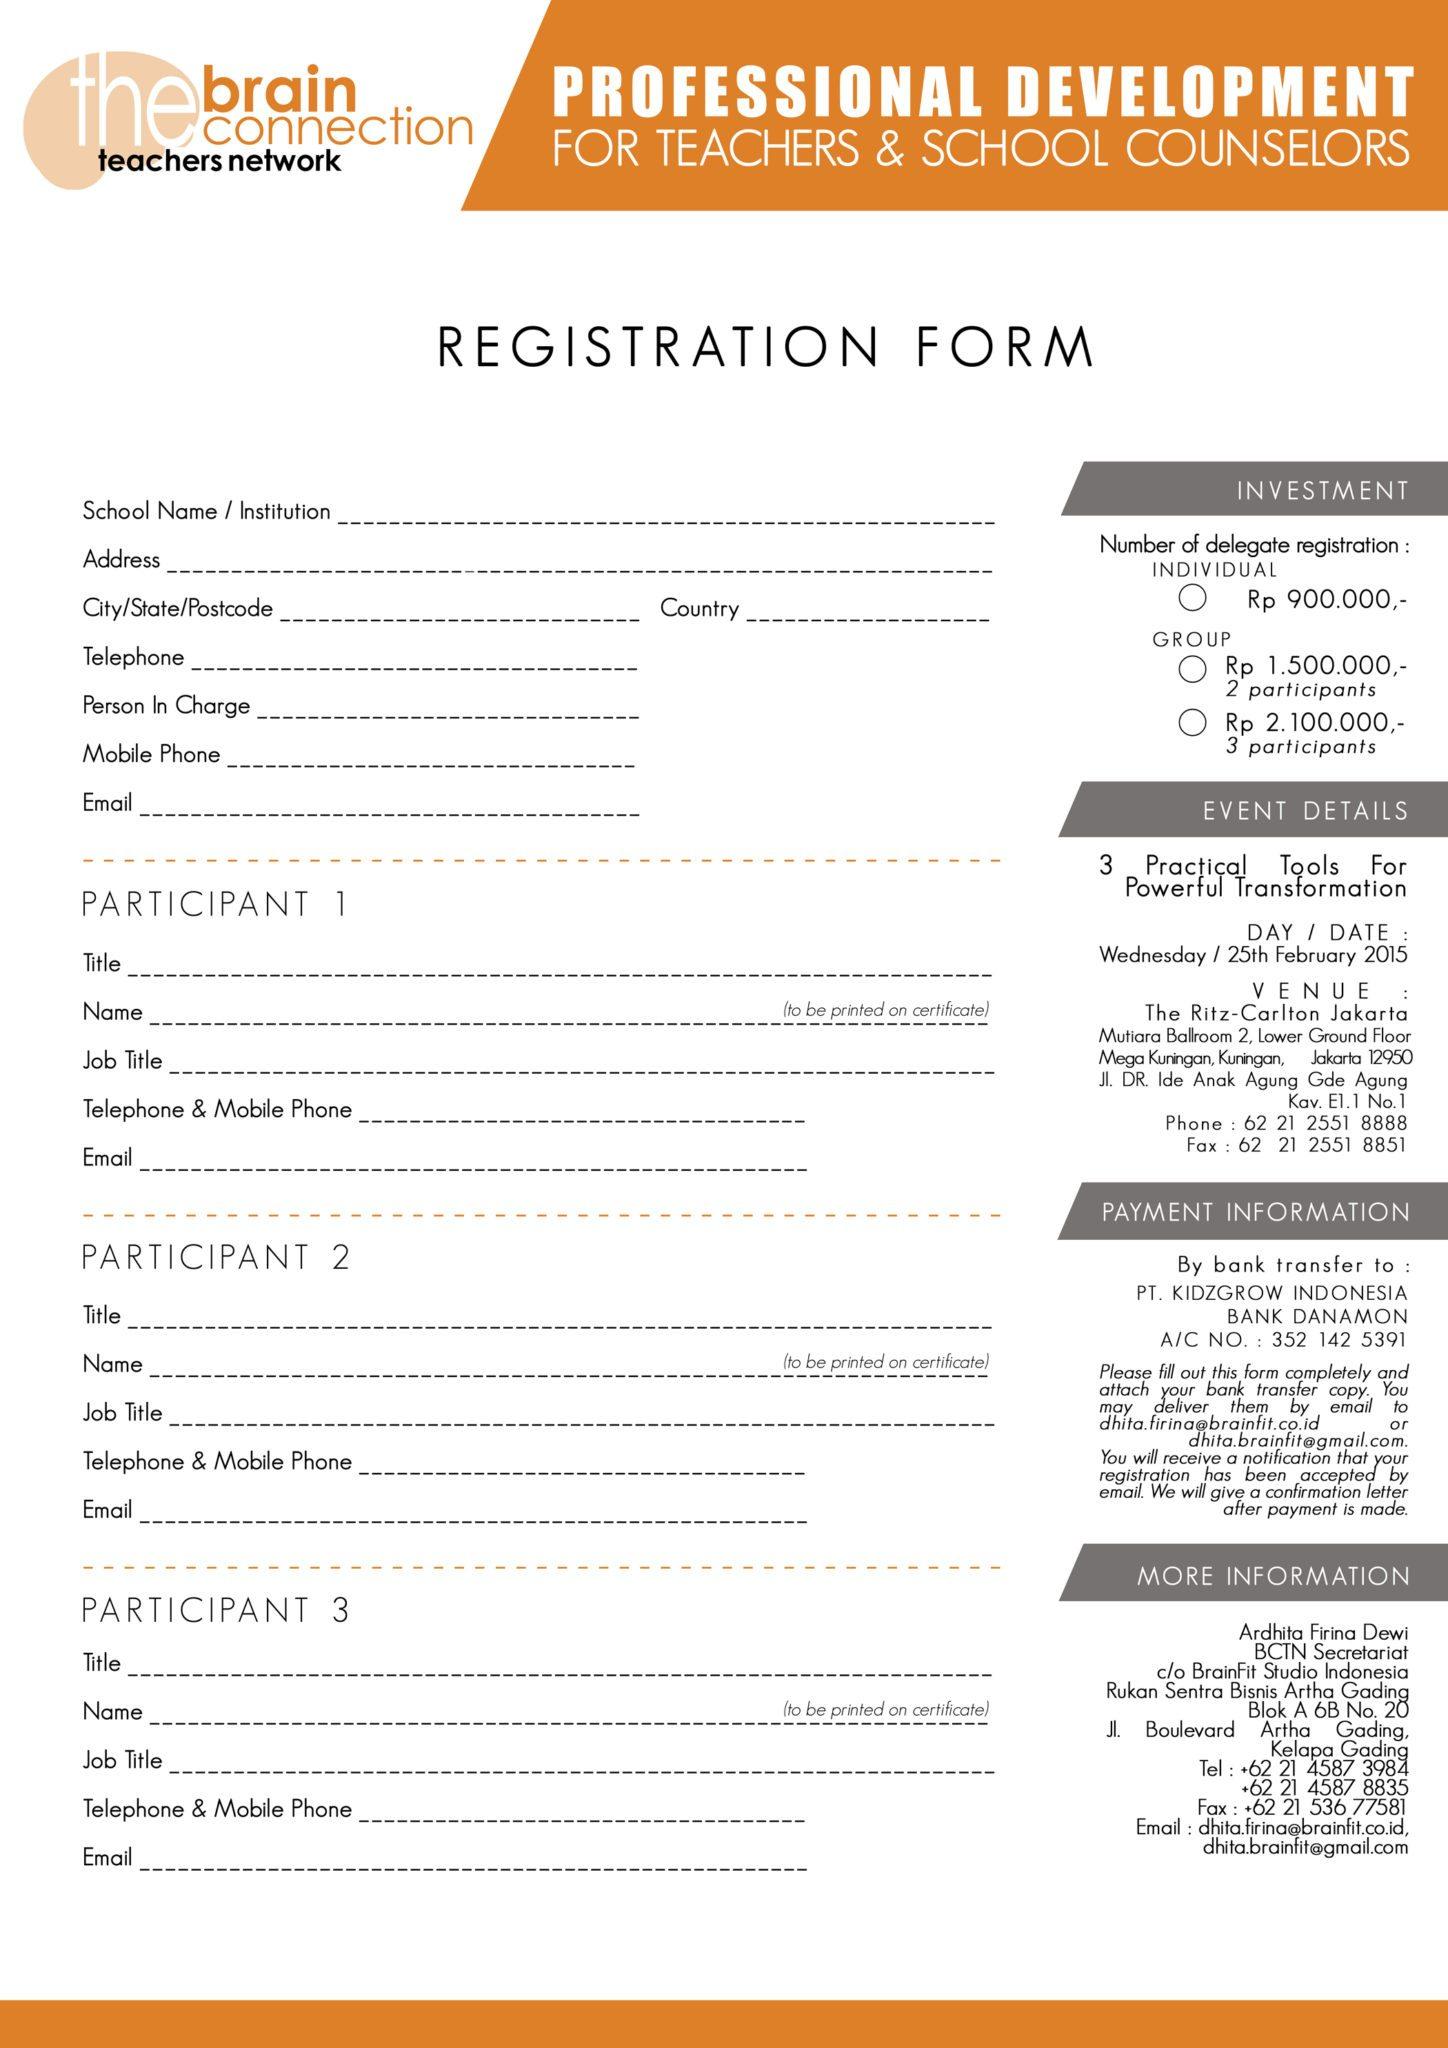 BCTN_reg form-120215_small